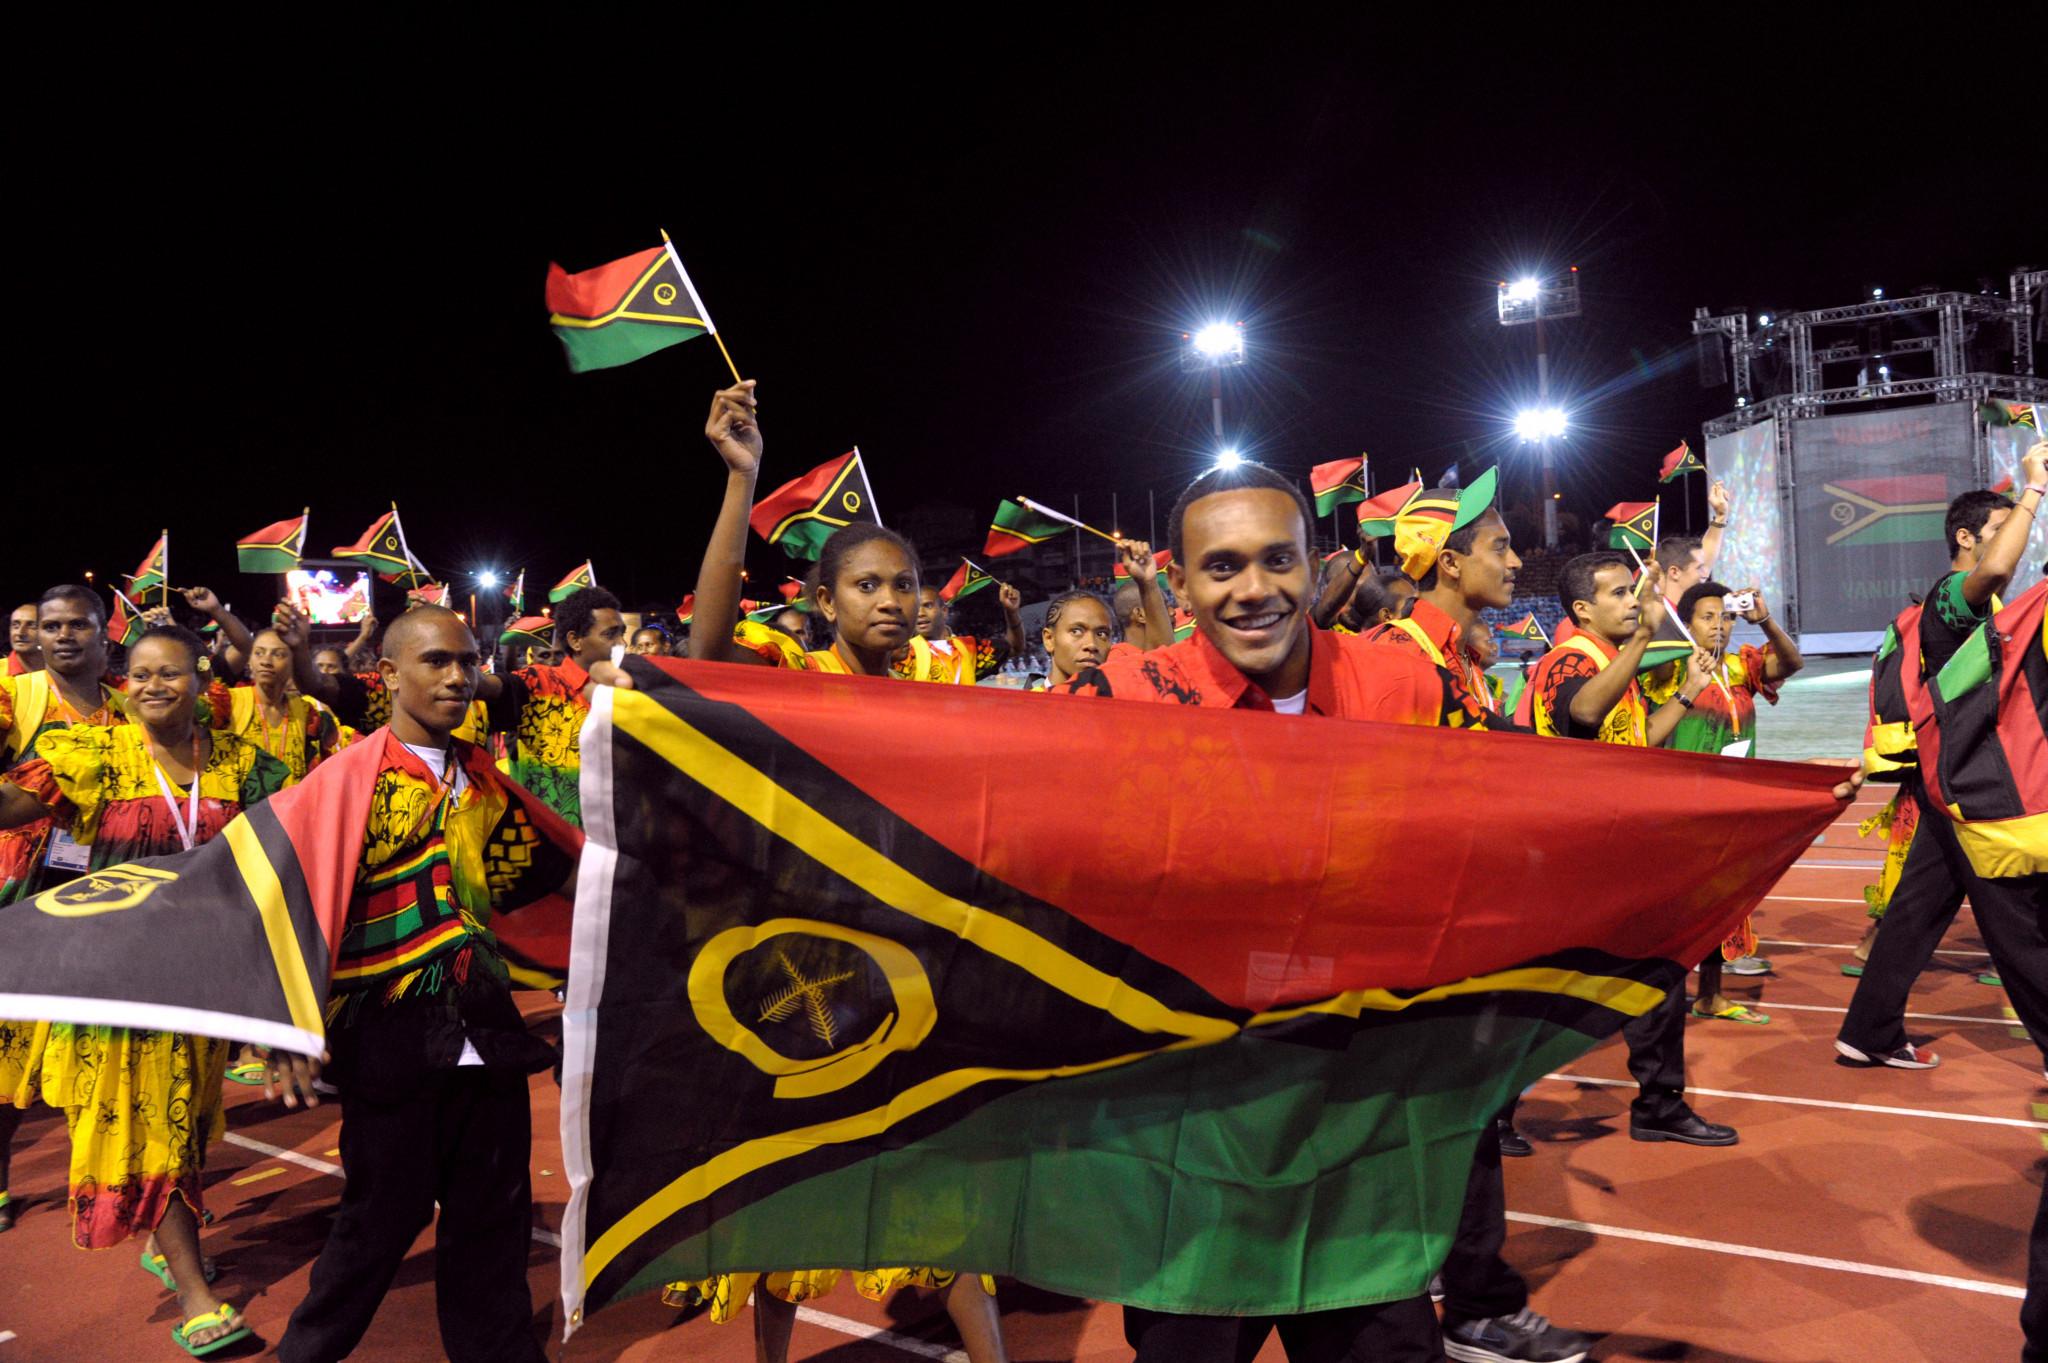 Tahiti or Vanuatu set to be chosen as 2027 Pacific Games host next month